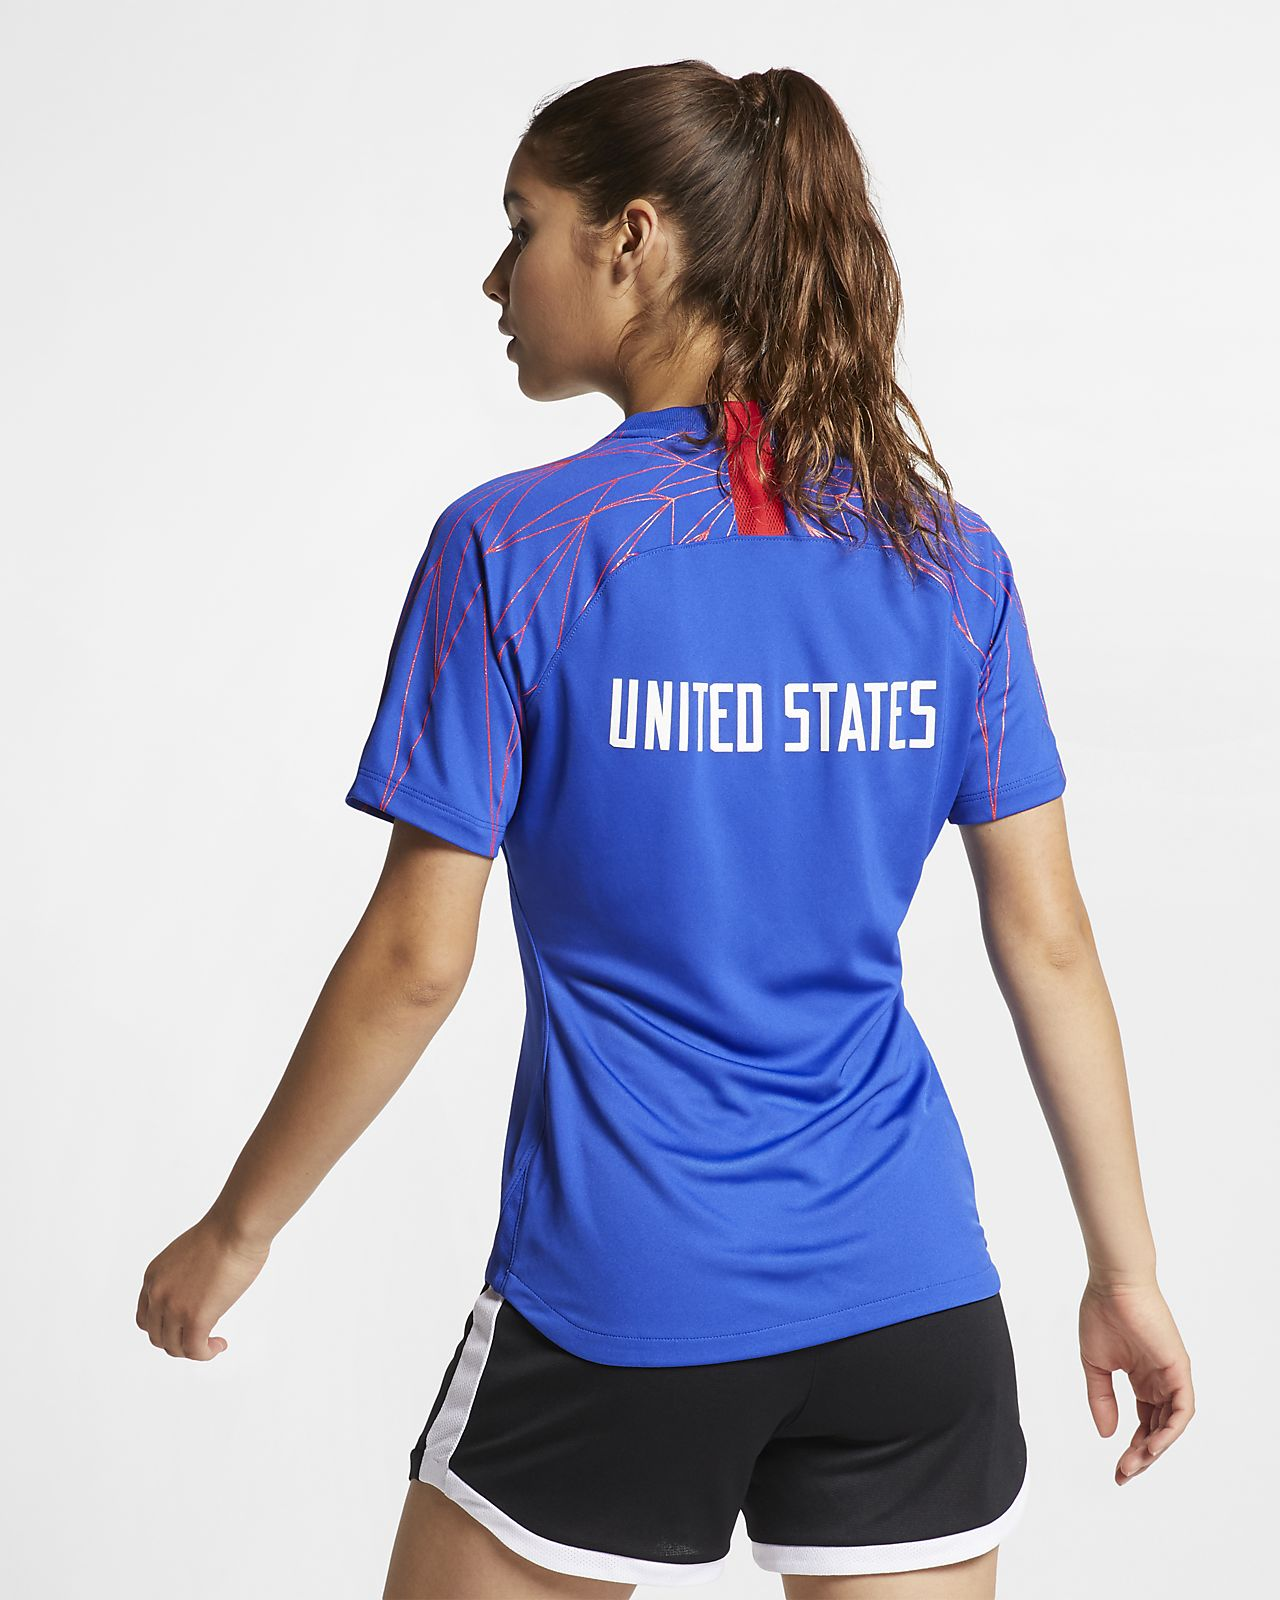 e8879262081 Nike Usa Womens Soccer T Shirt